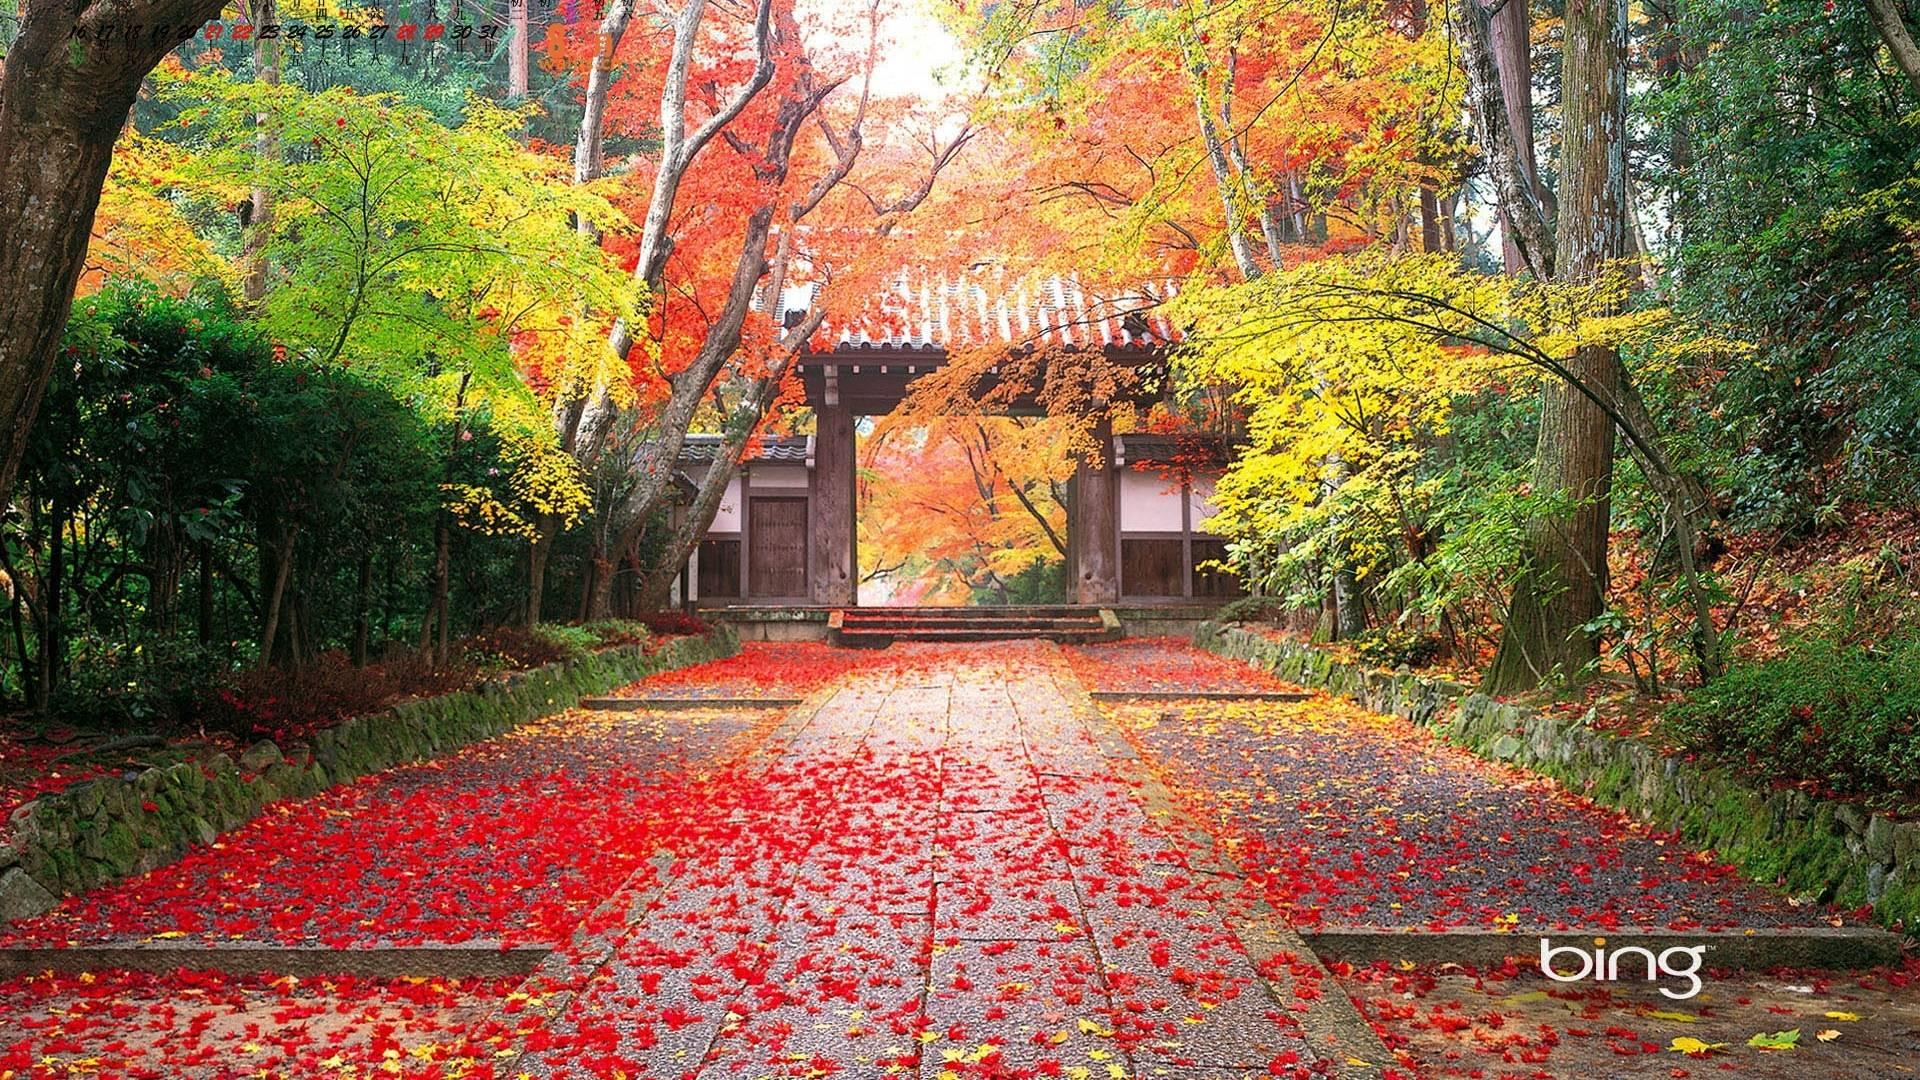 Bing Fall Wallpaper Bing Wallpapers Gallery Wallpaper Cave